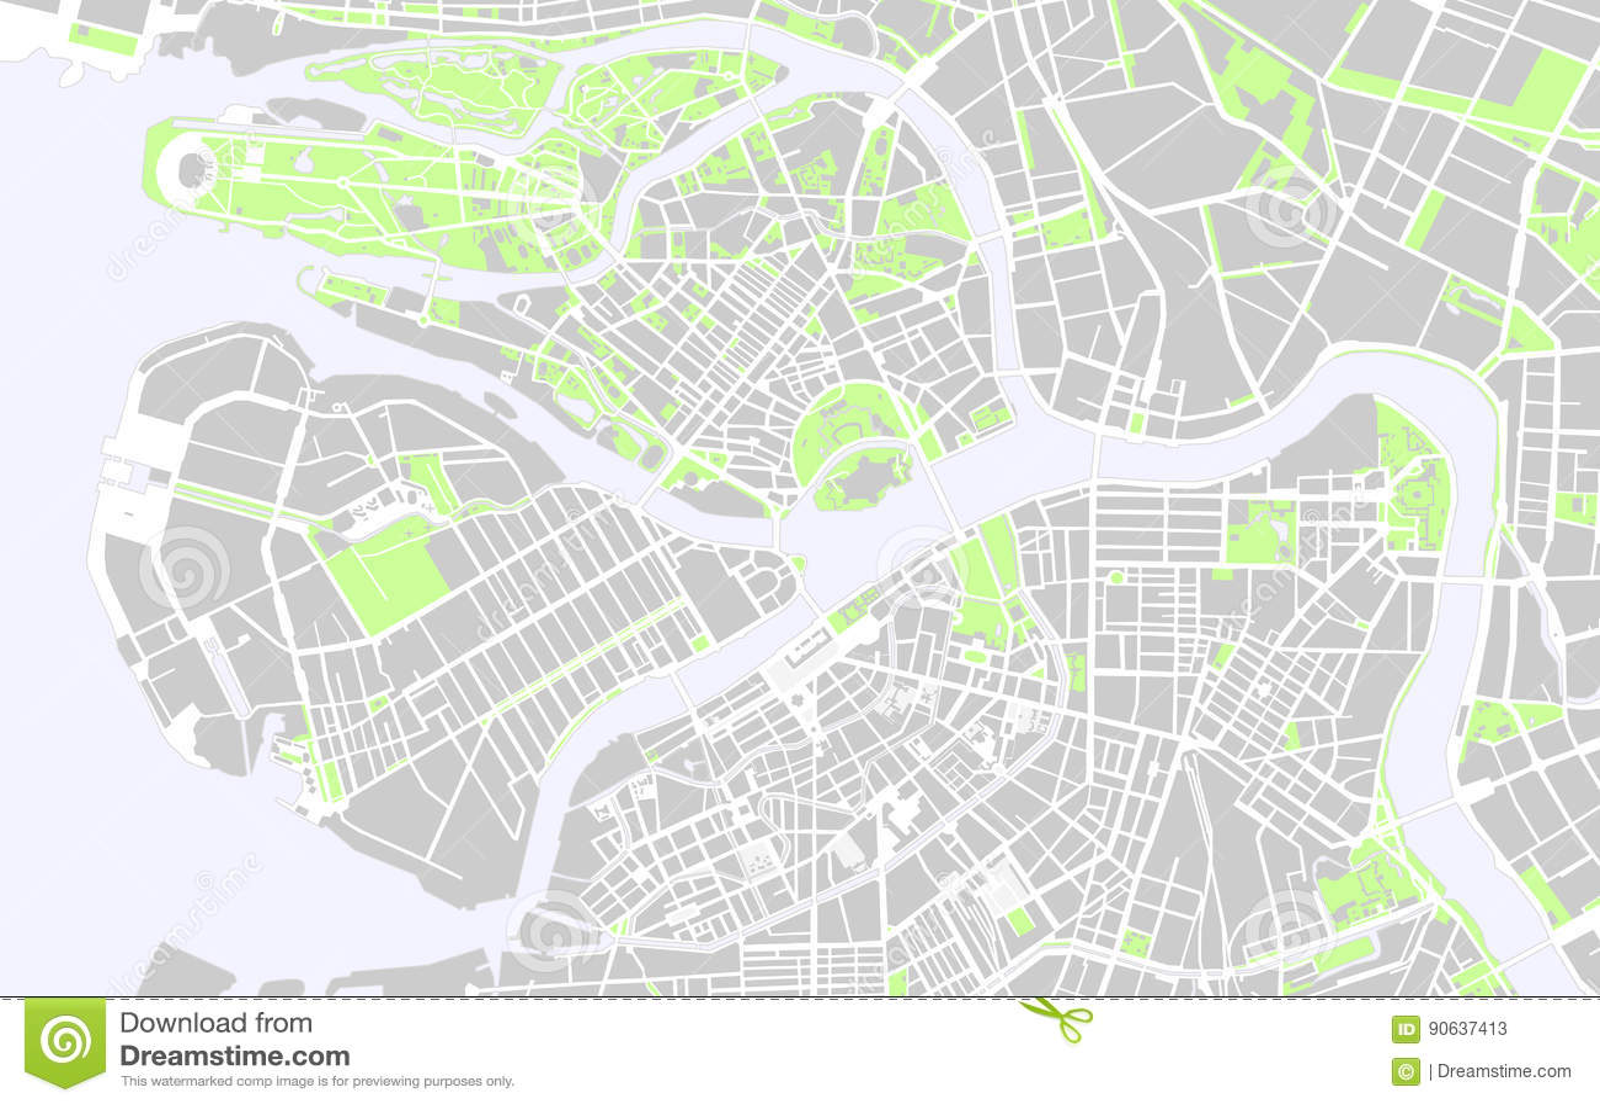 Mappe di San Pietroburgo